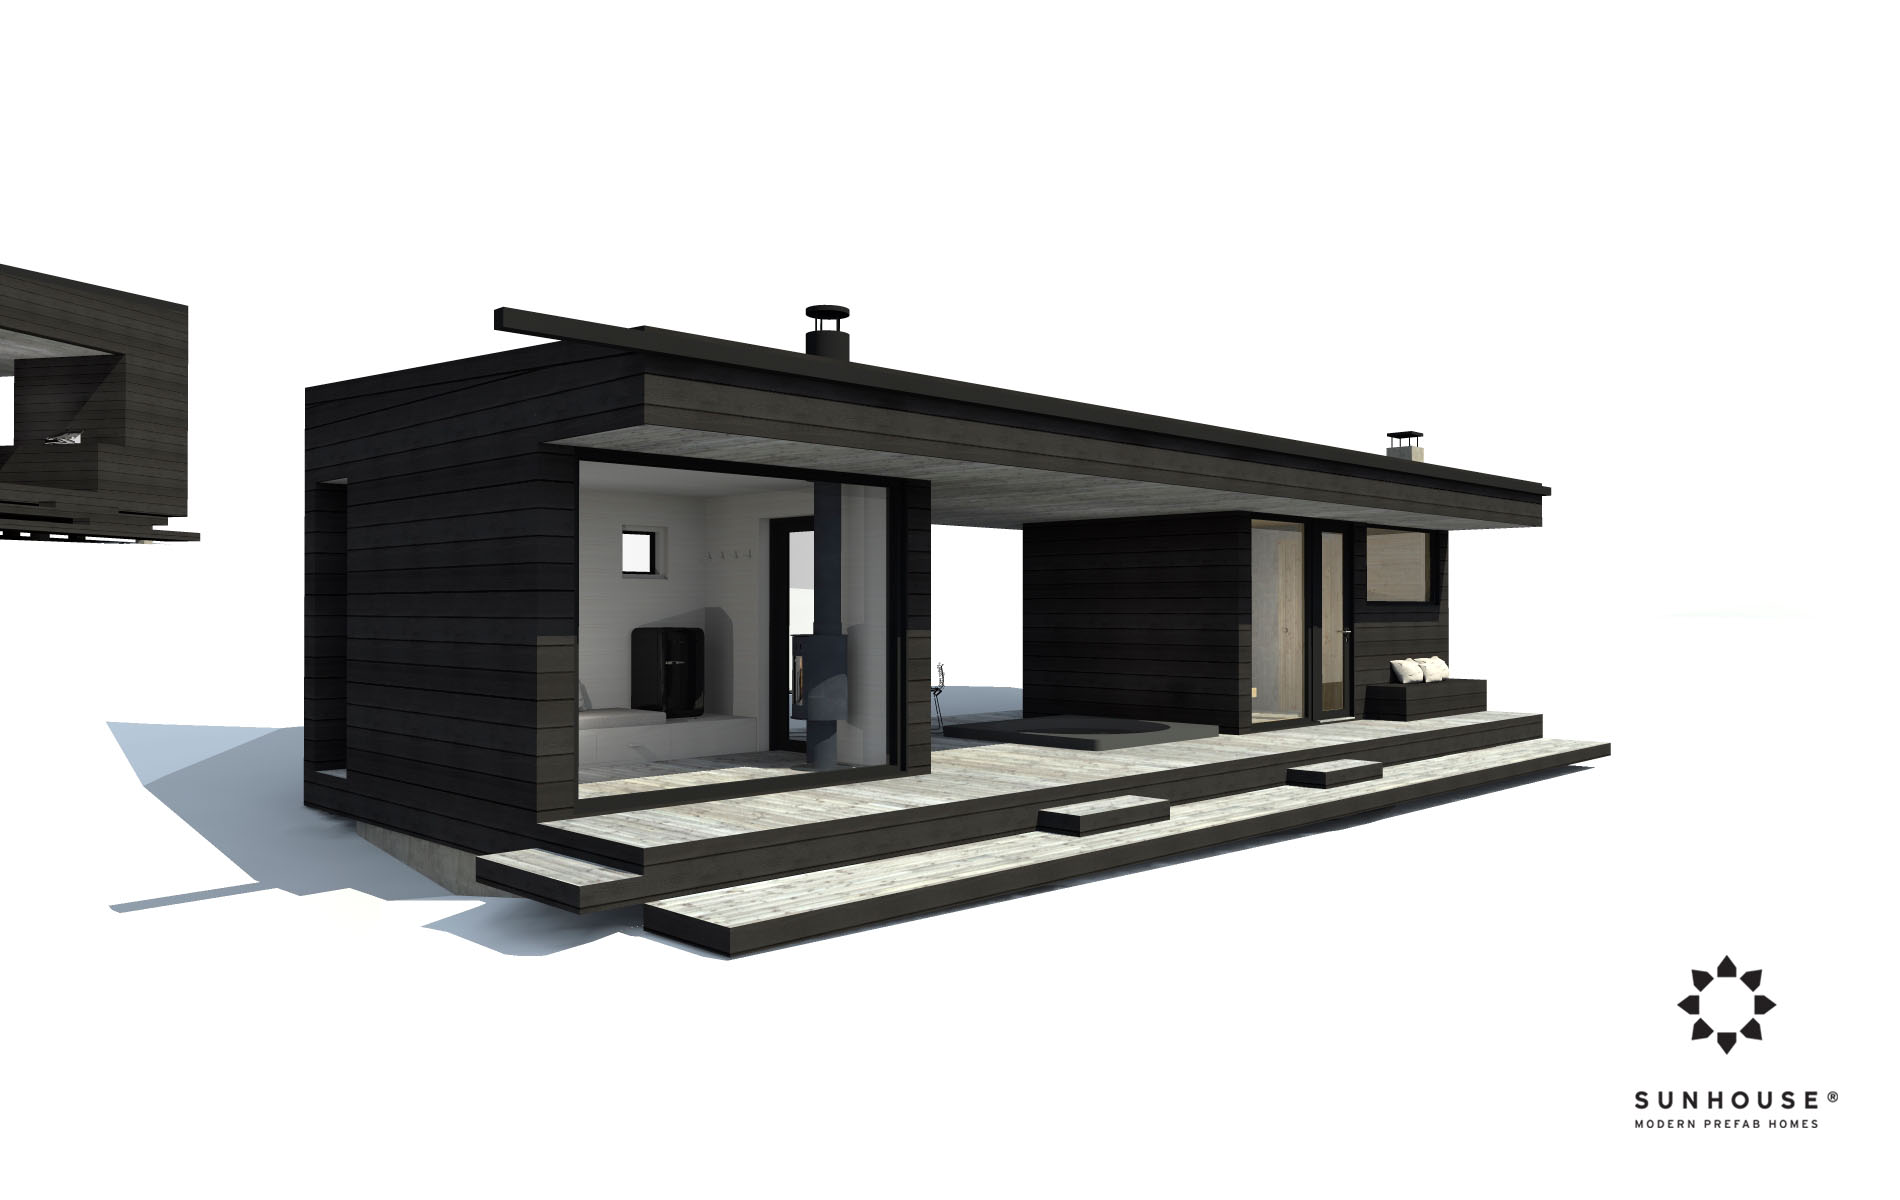 Sunhouse S180107 sauna